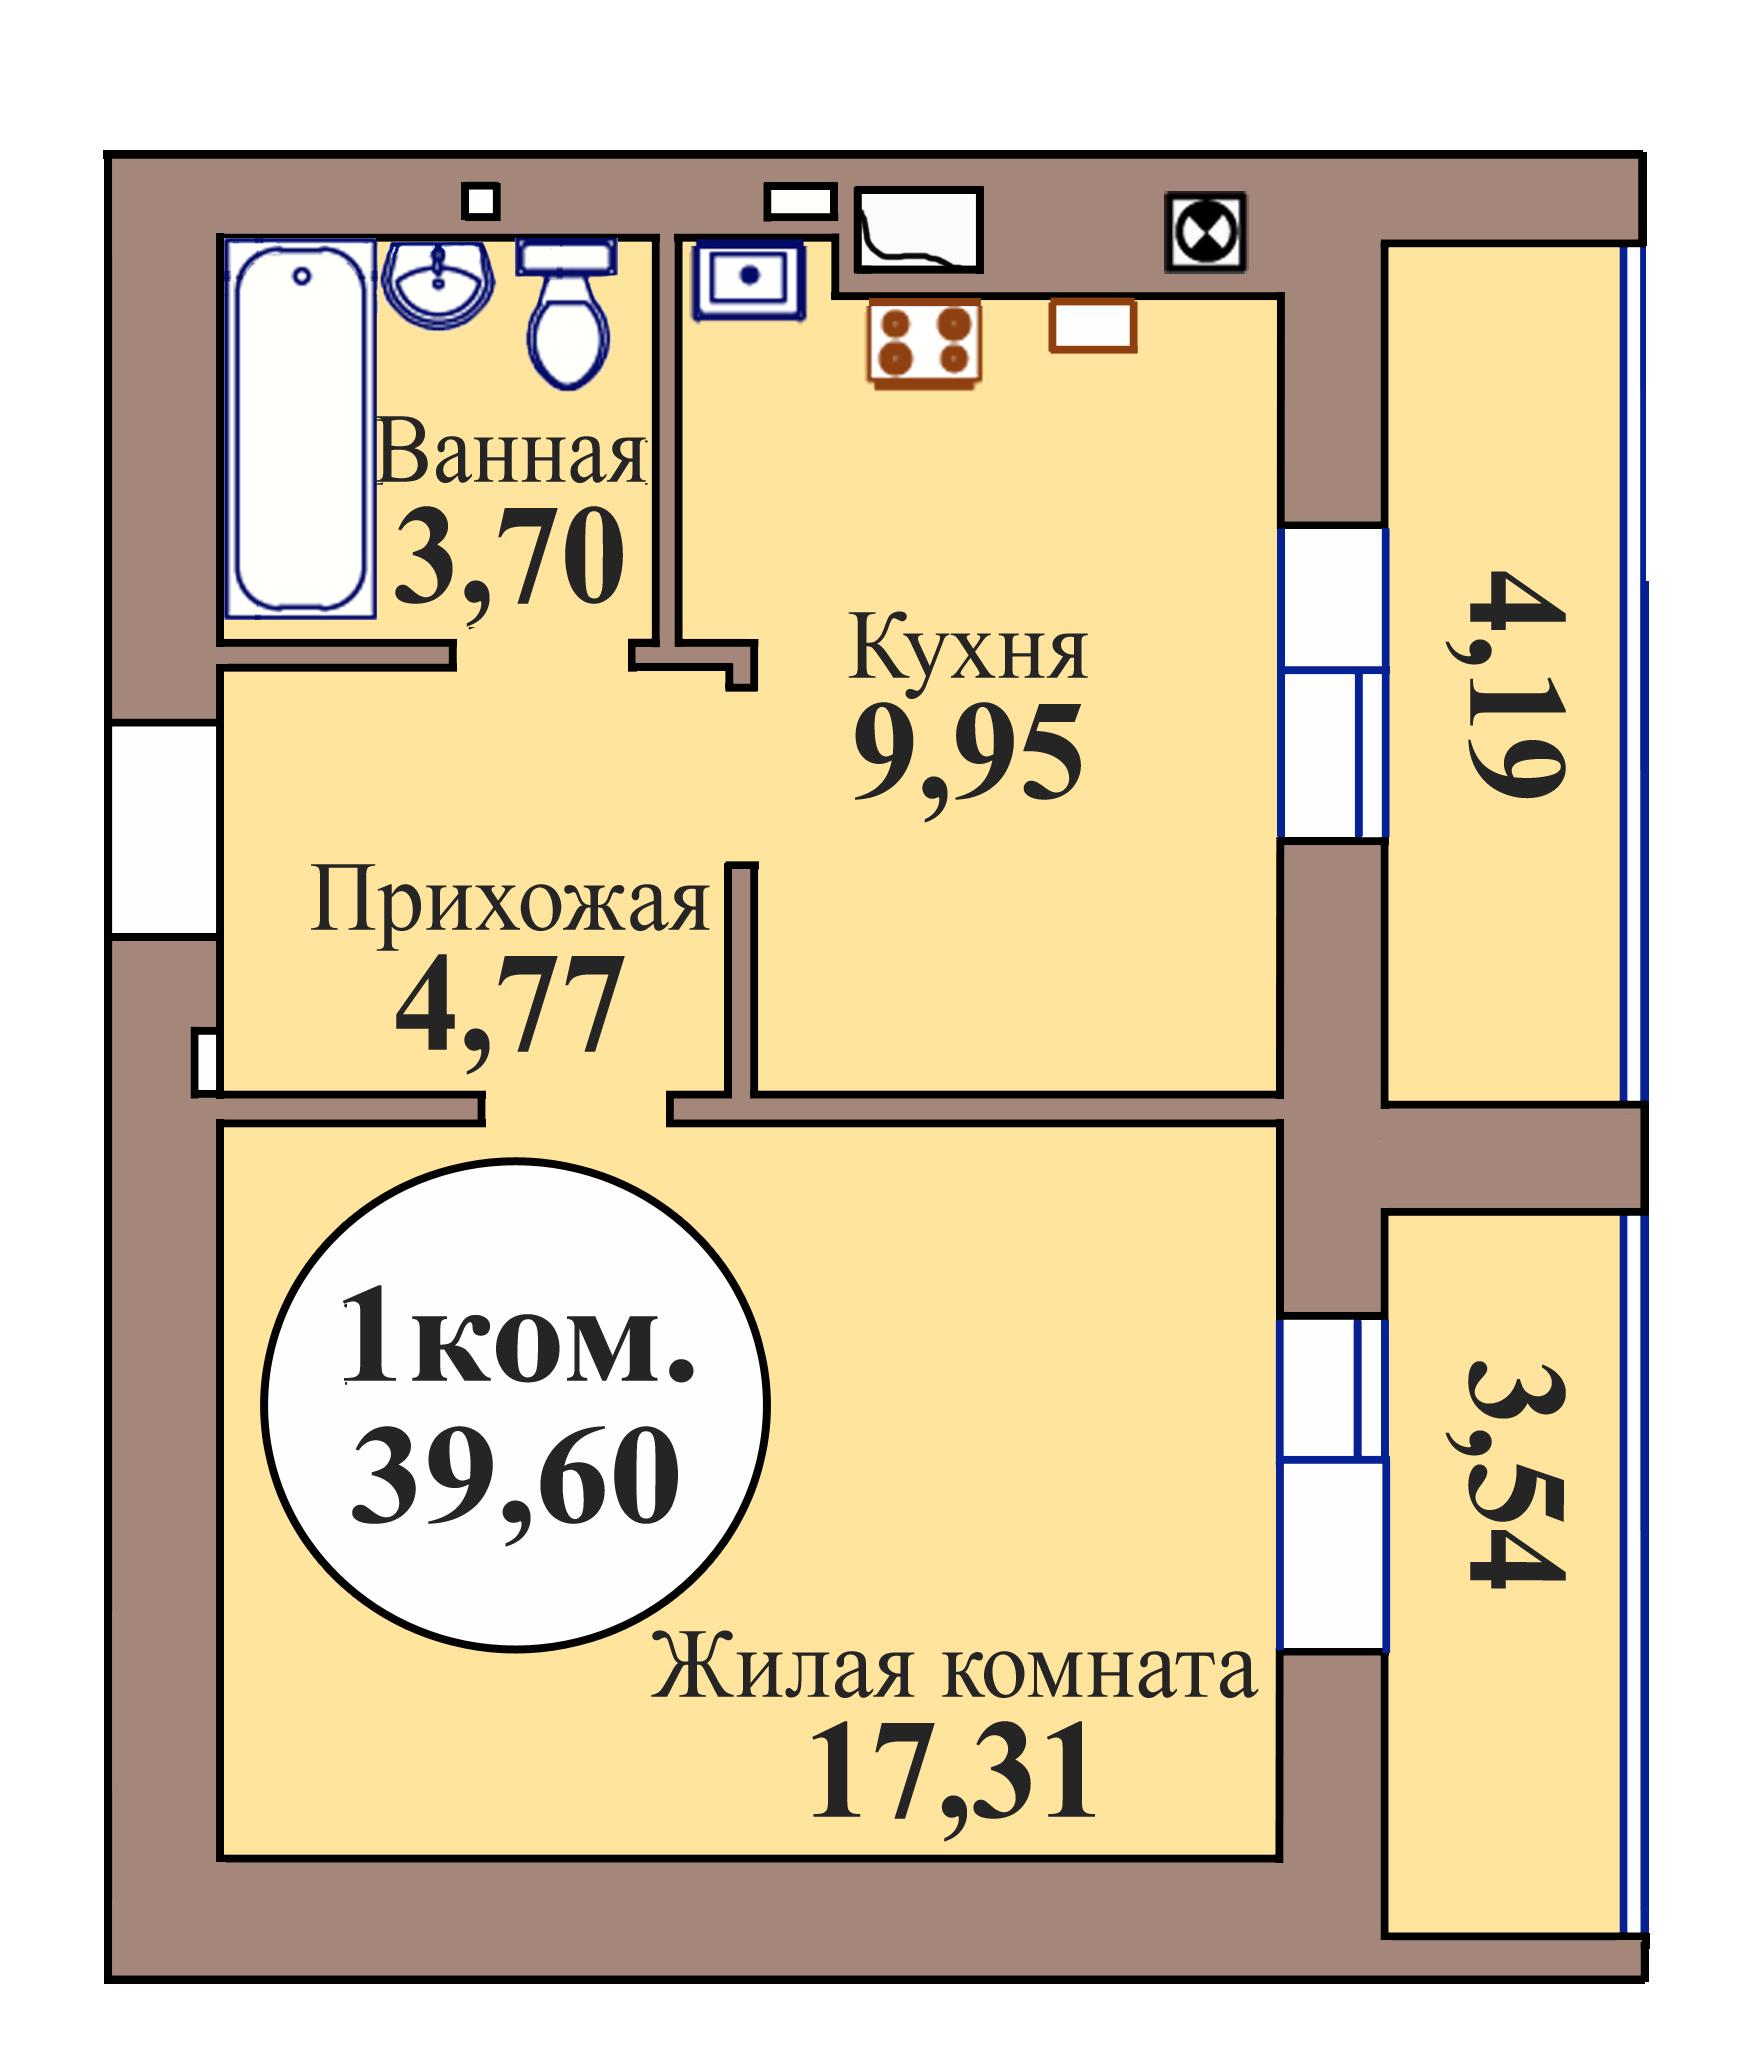 1-комн. кв. по пер. Калининградский, 5 кв. 73 в Калининграде